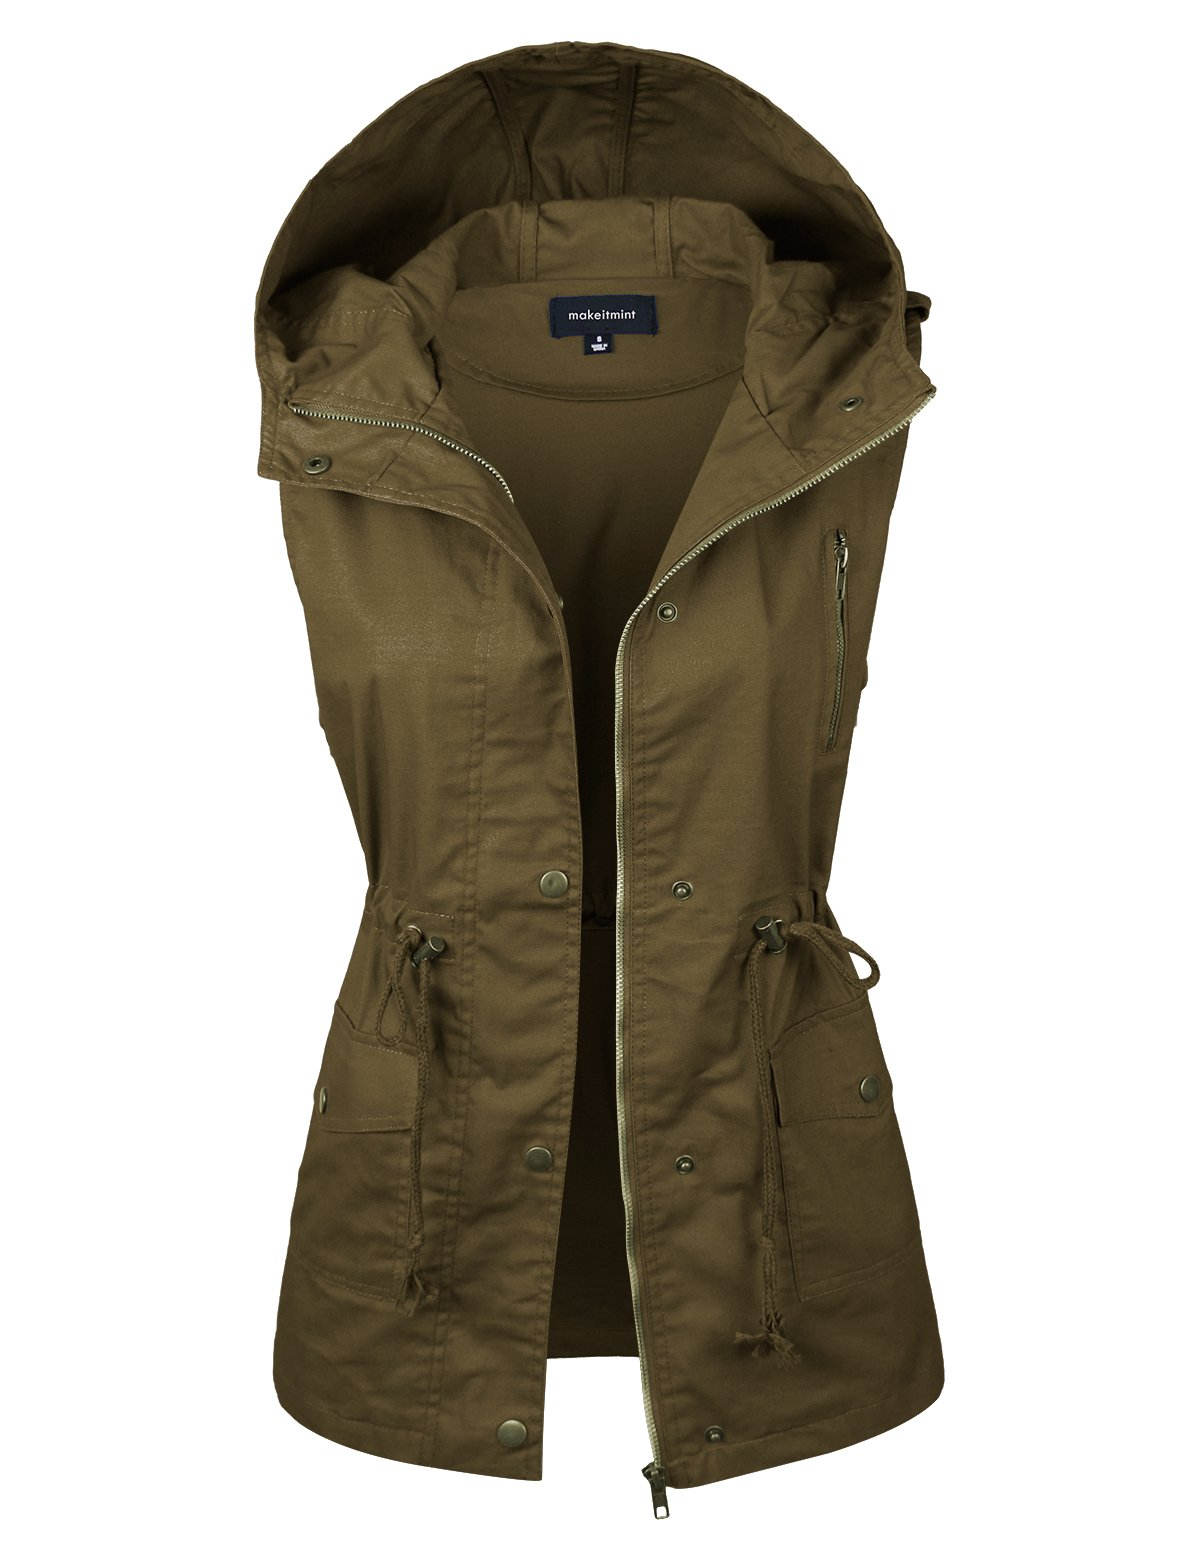 makeitmint Women's Hooded Utility Pocket Anorak Jacket Vest [S-3XL/9 Colors] YJV0018-43DKOLIVE-1XL